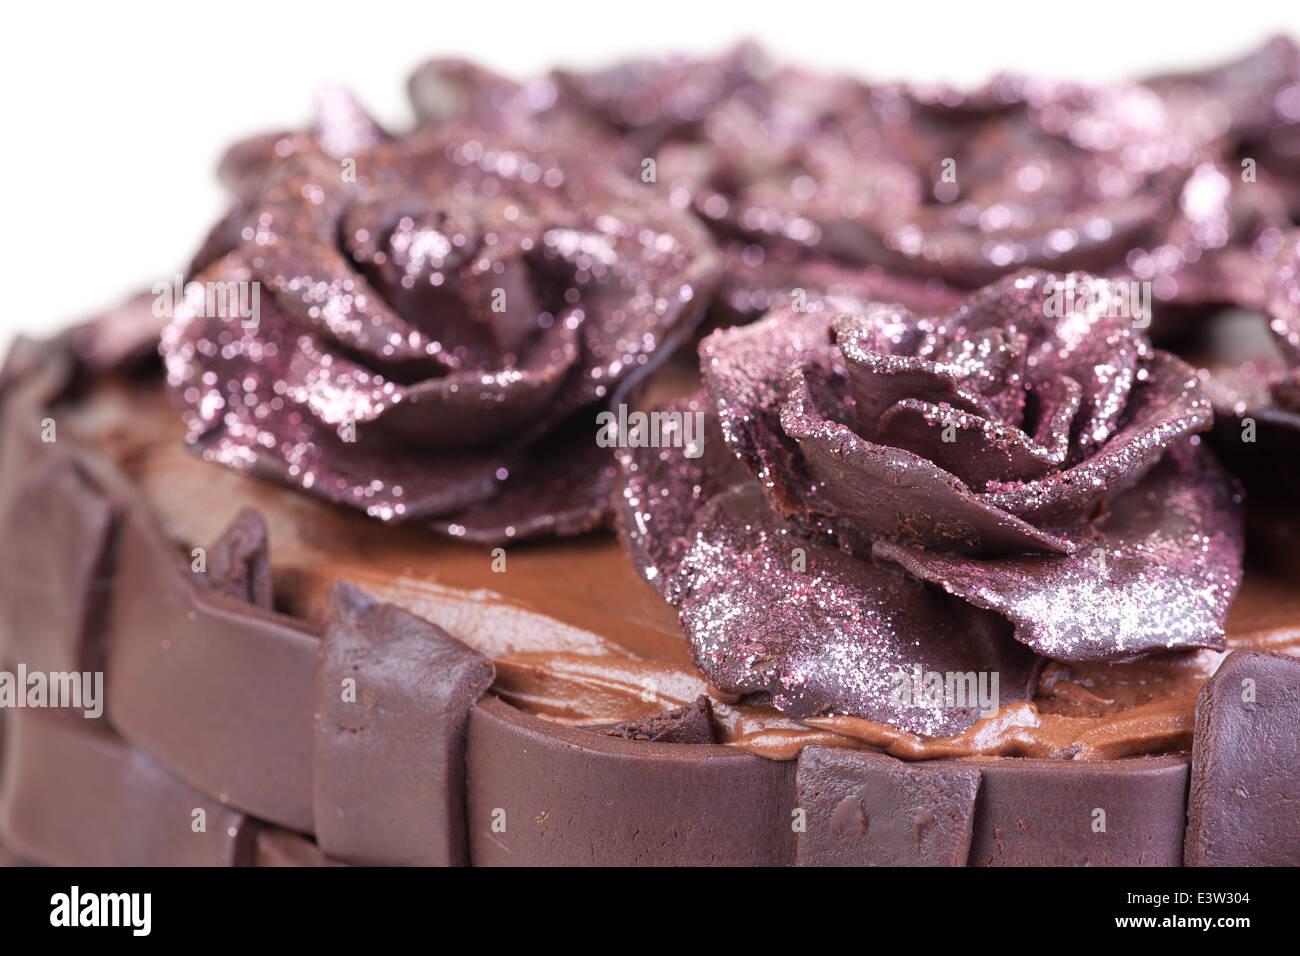 Beautiful Chocolate Cake With Pink Glitter Roses Stock Photo